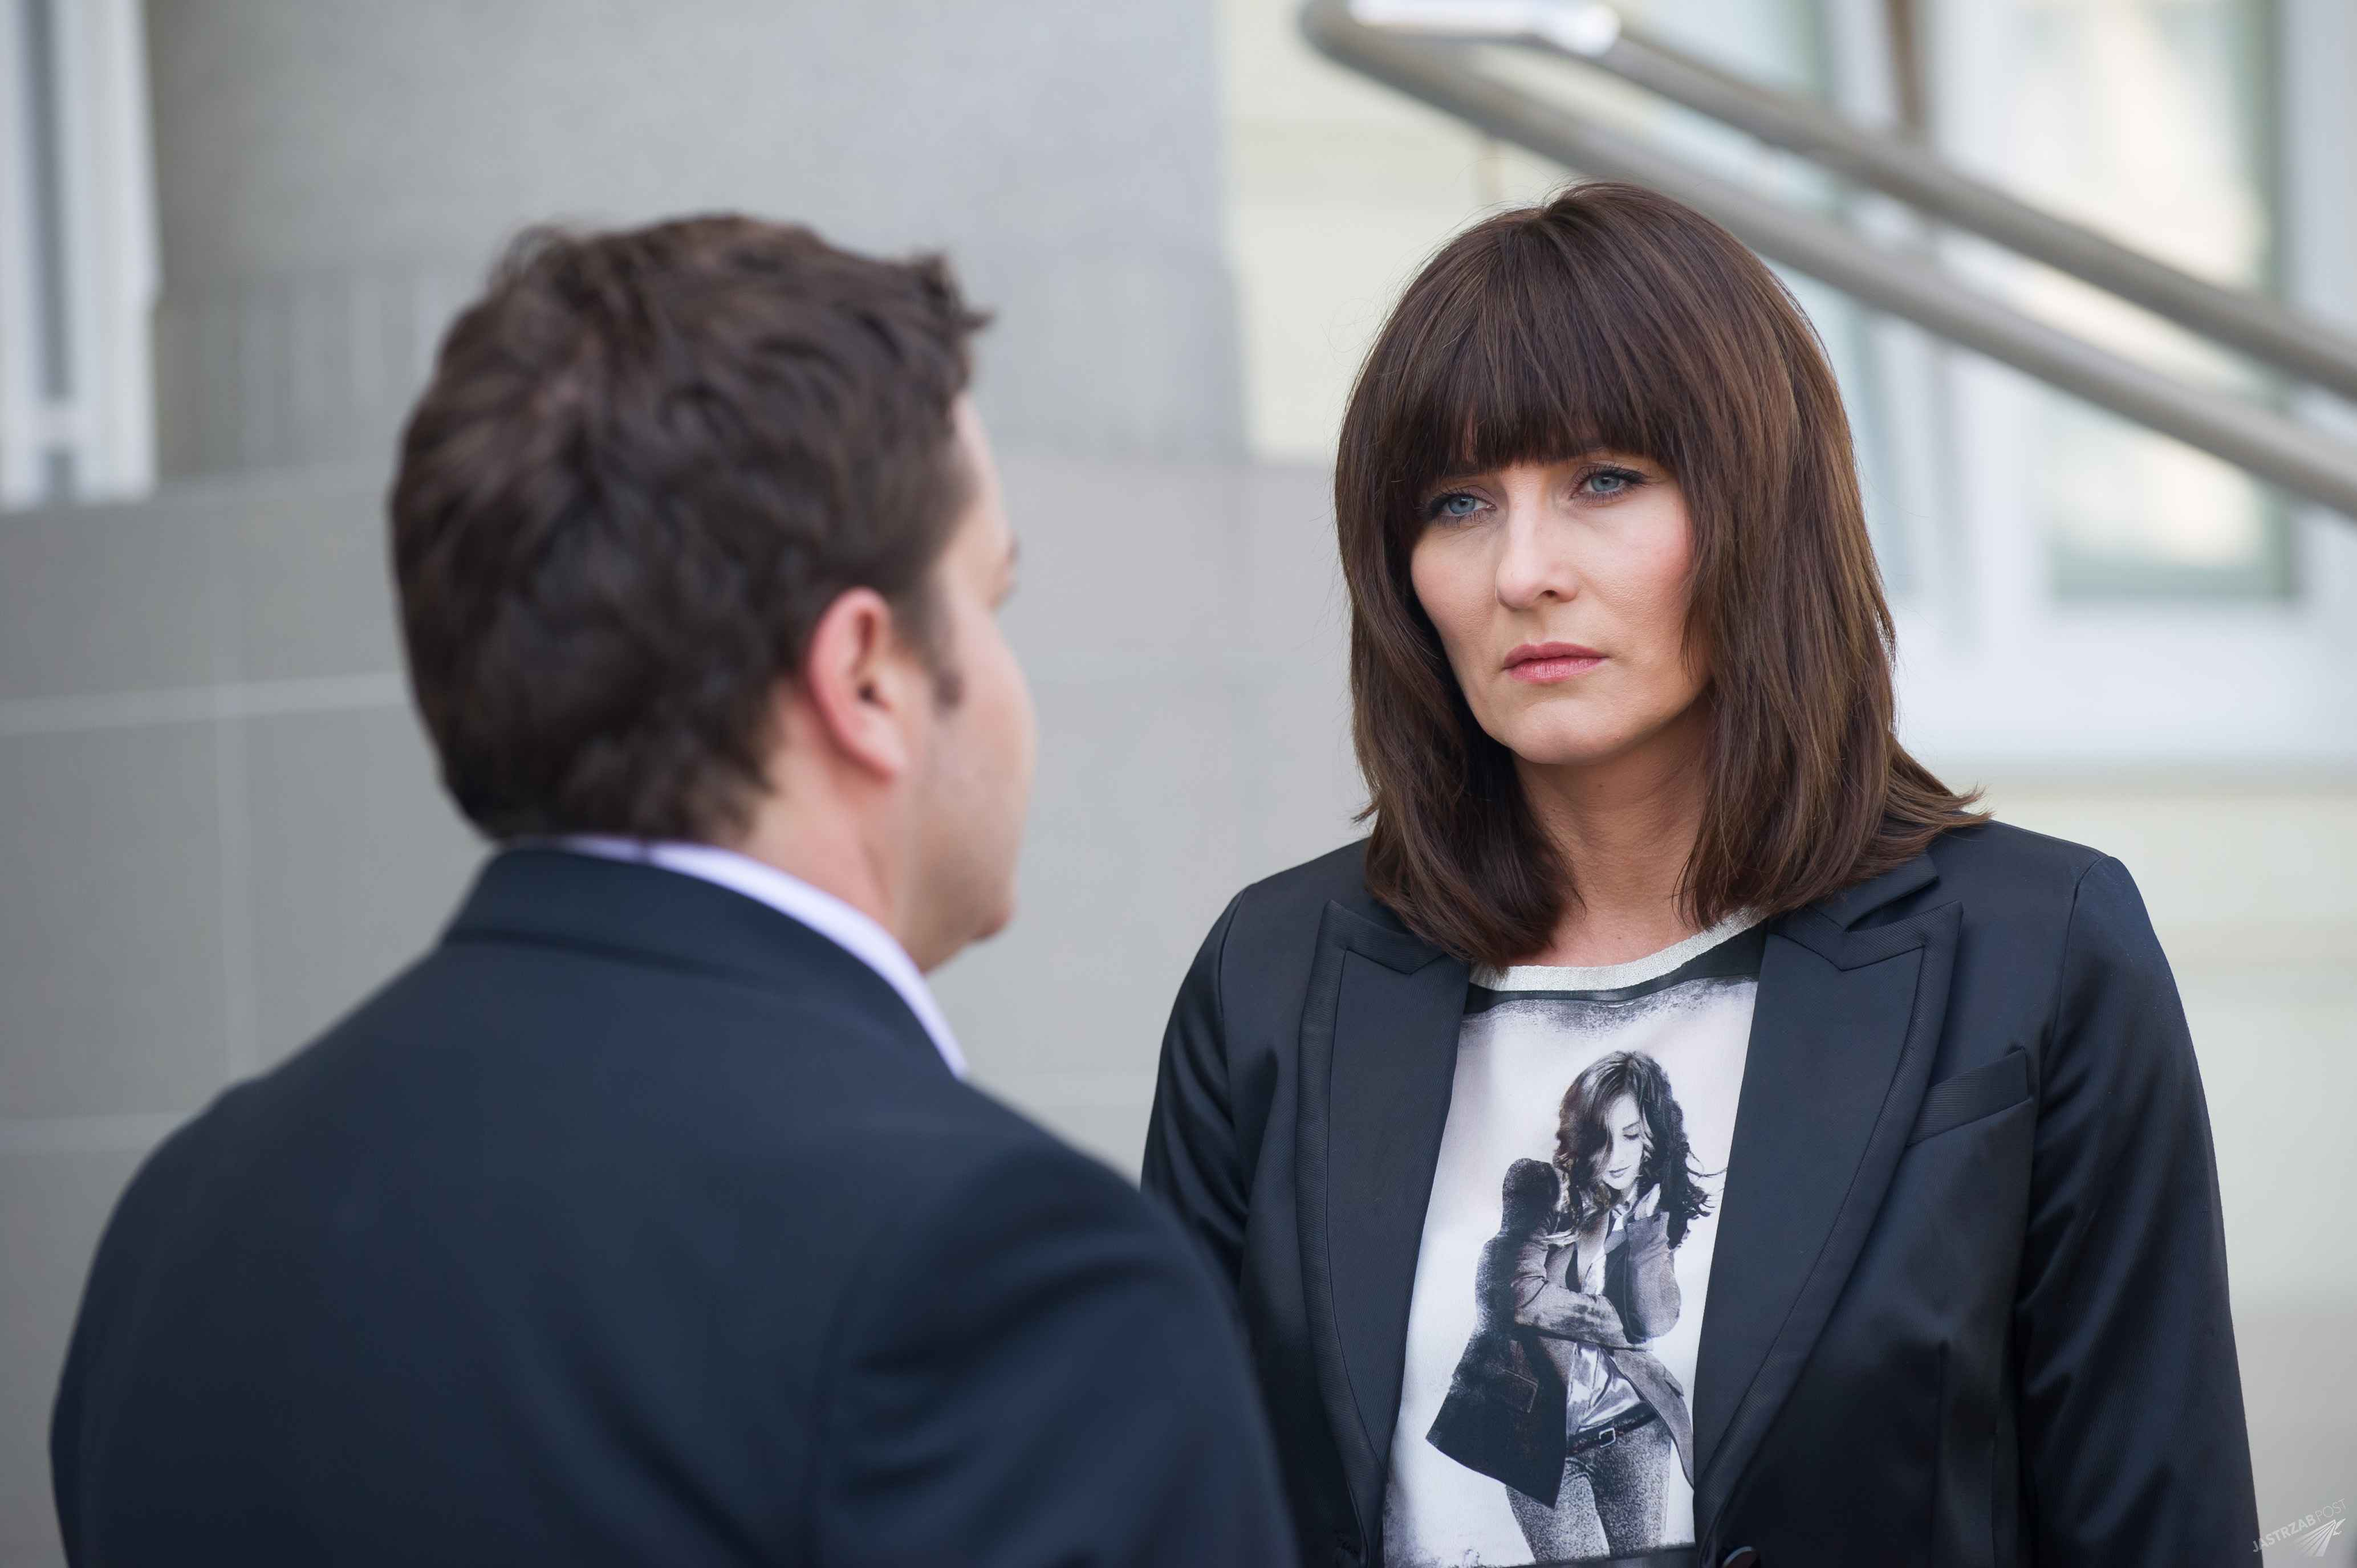 Na Wspólnej odcinek 2170, Kinga (Ilona Wrońska), Michał (Robert Kudelski), fot. x-news